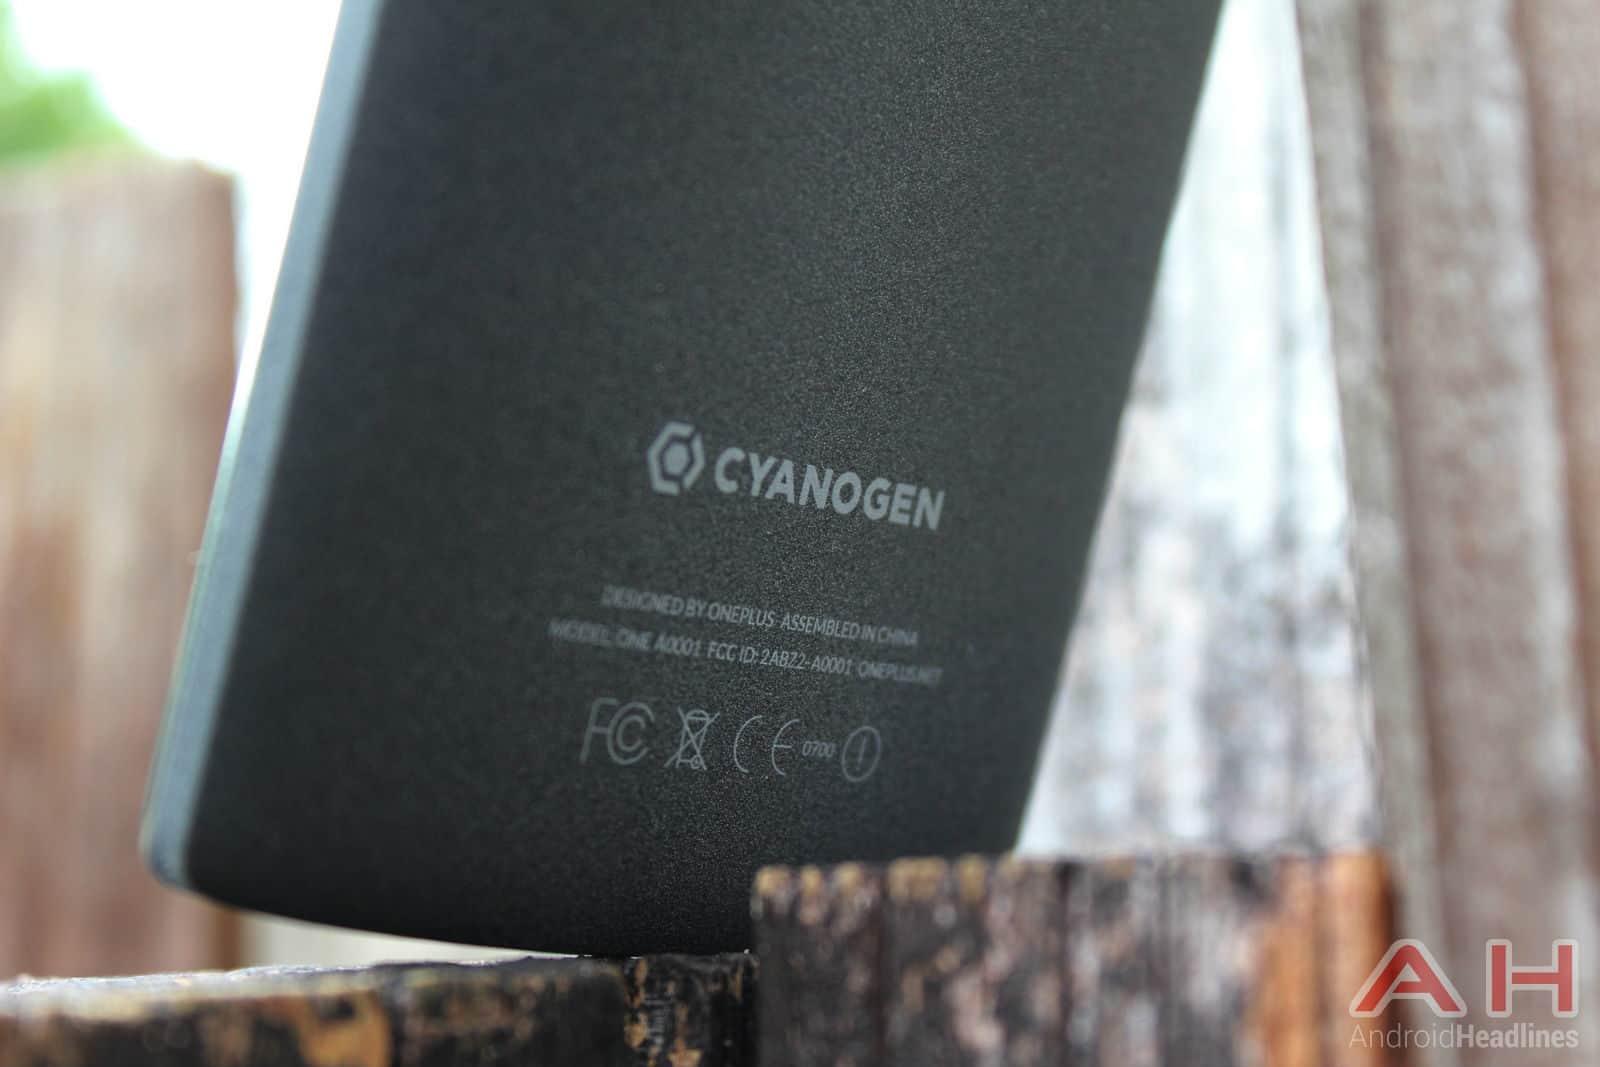 OnePlus-One-back-Cyanogenmod